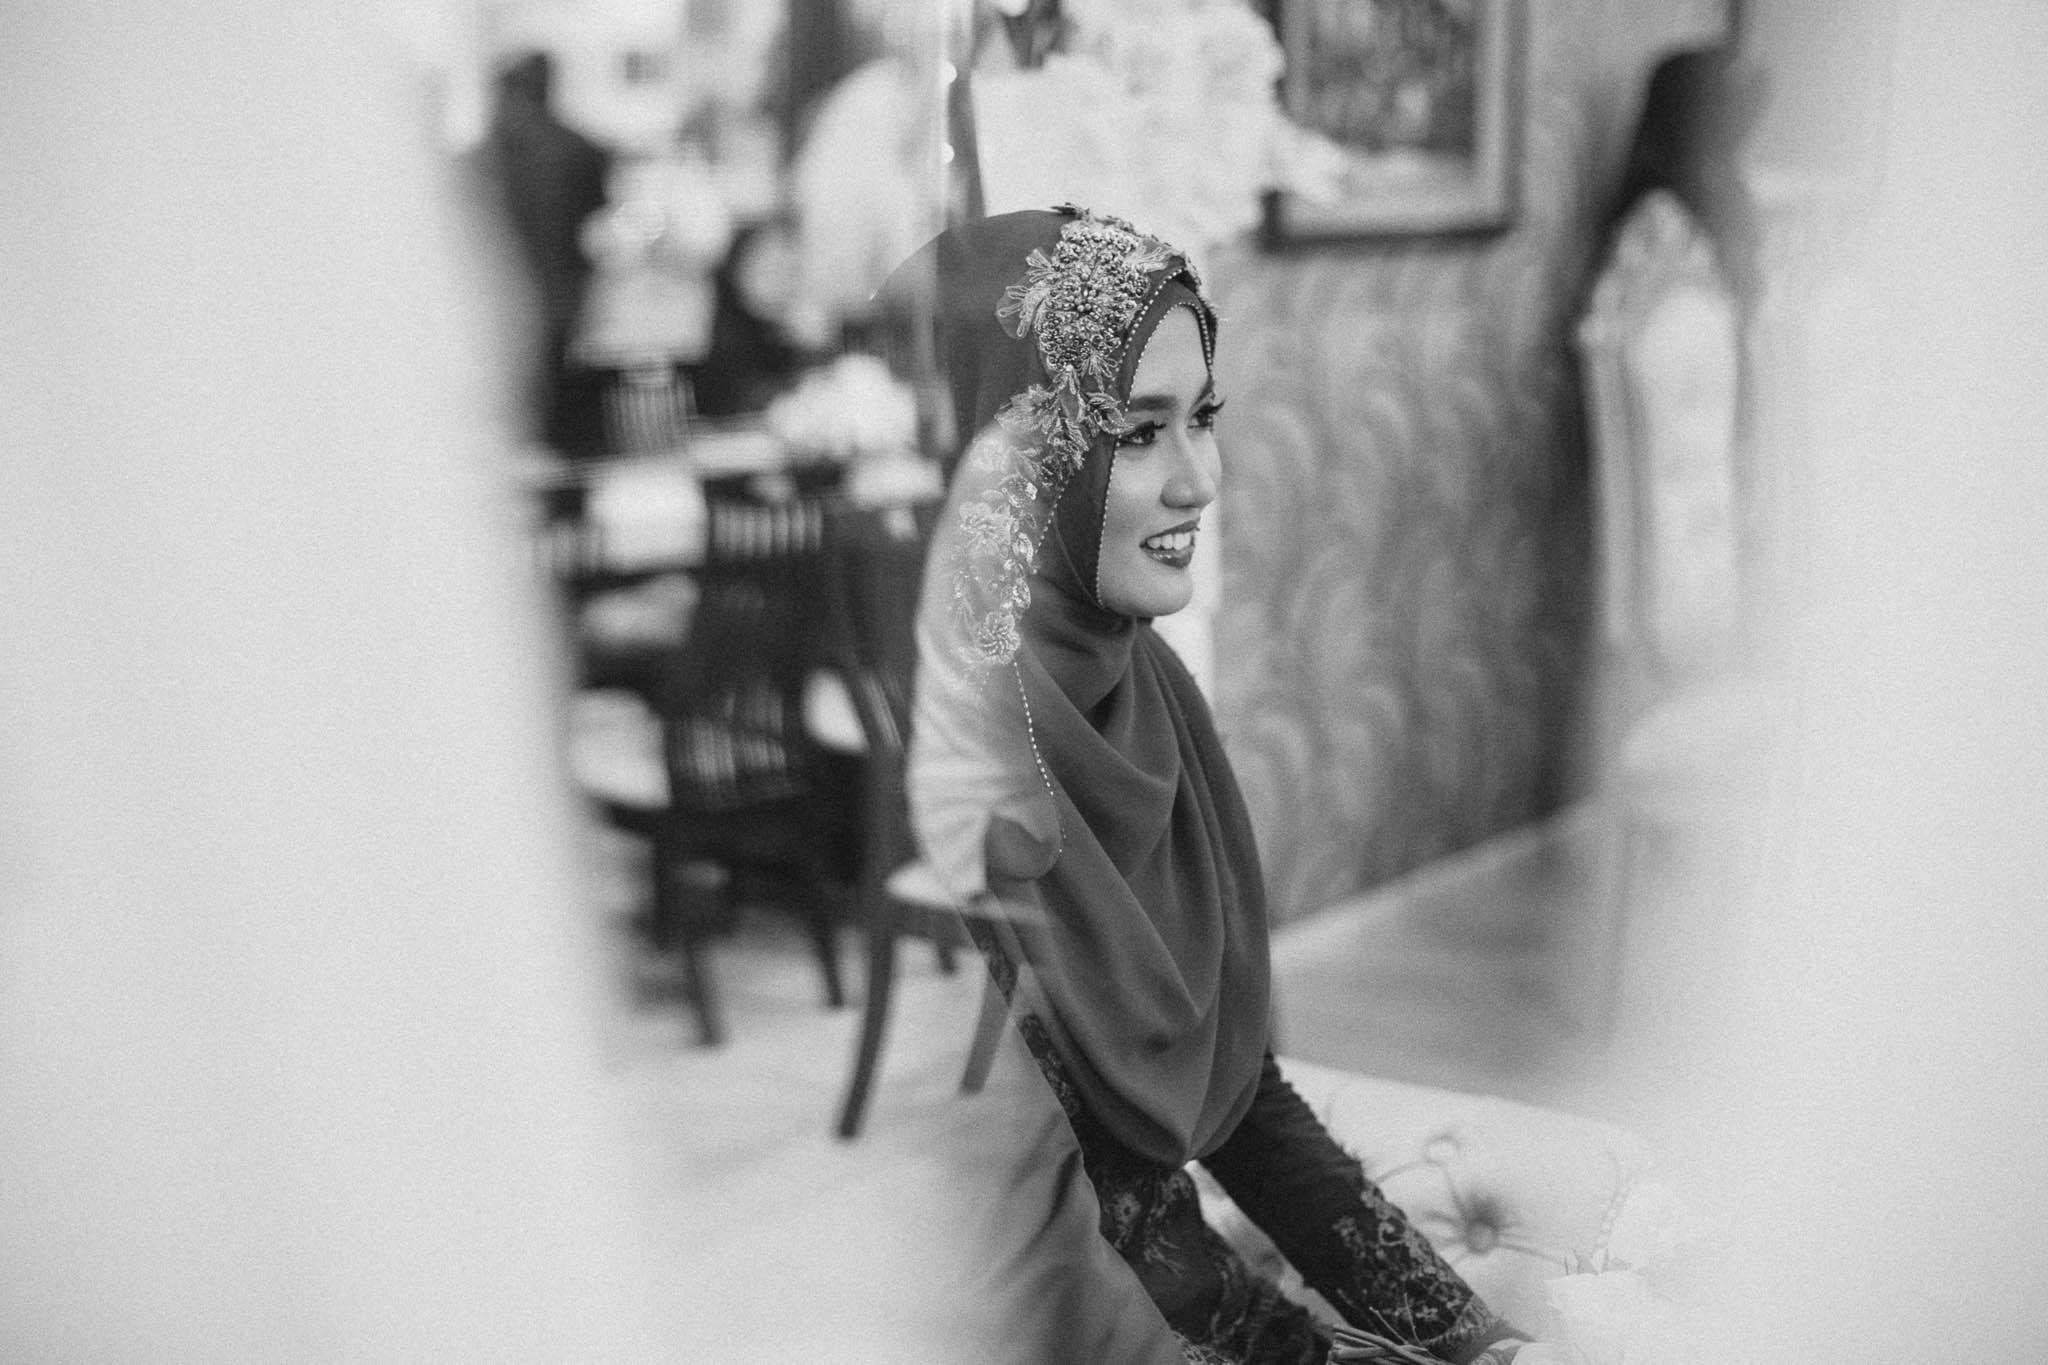 singapore-wedding-photographer-sharalyn-syazwan-058.jpg